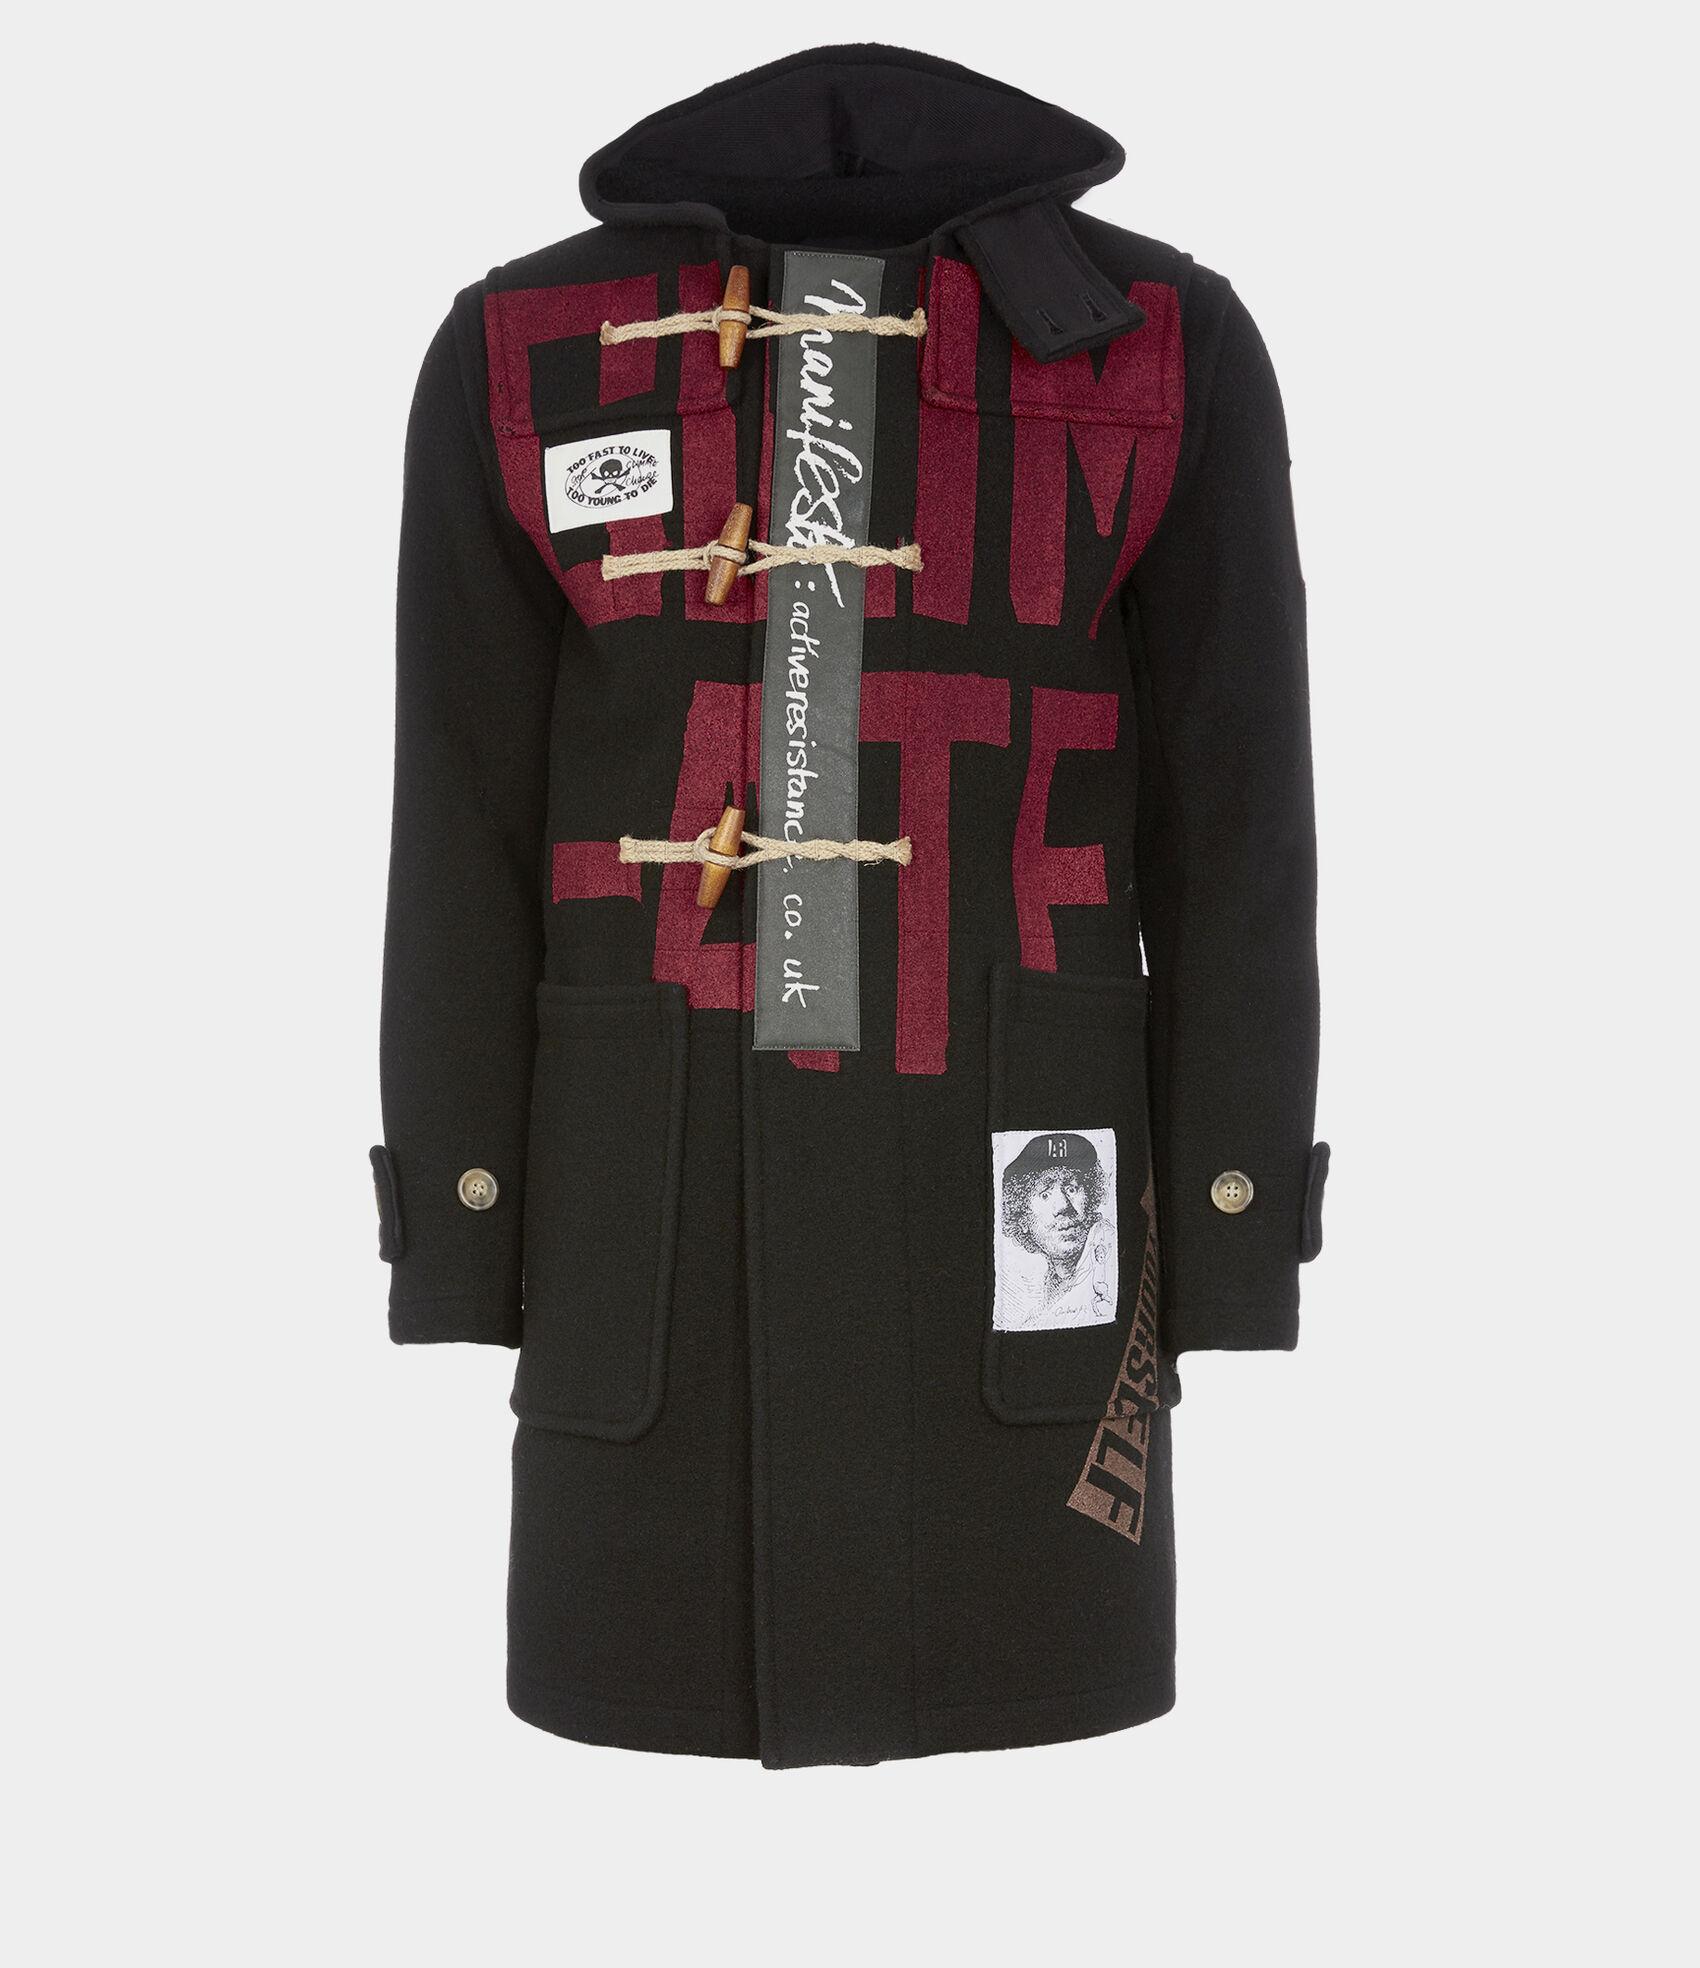 Vivienne Westwood Men S Designer Jackets Coats Vivienne Westwood